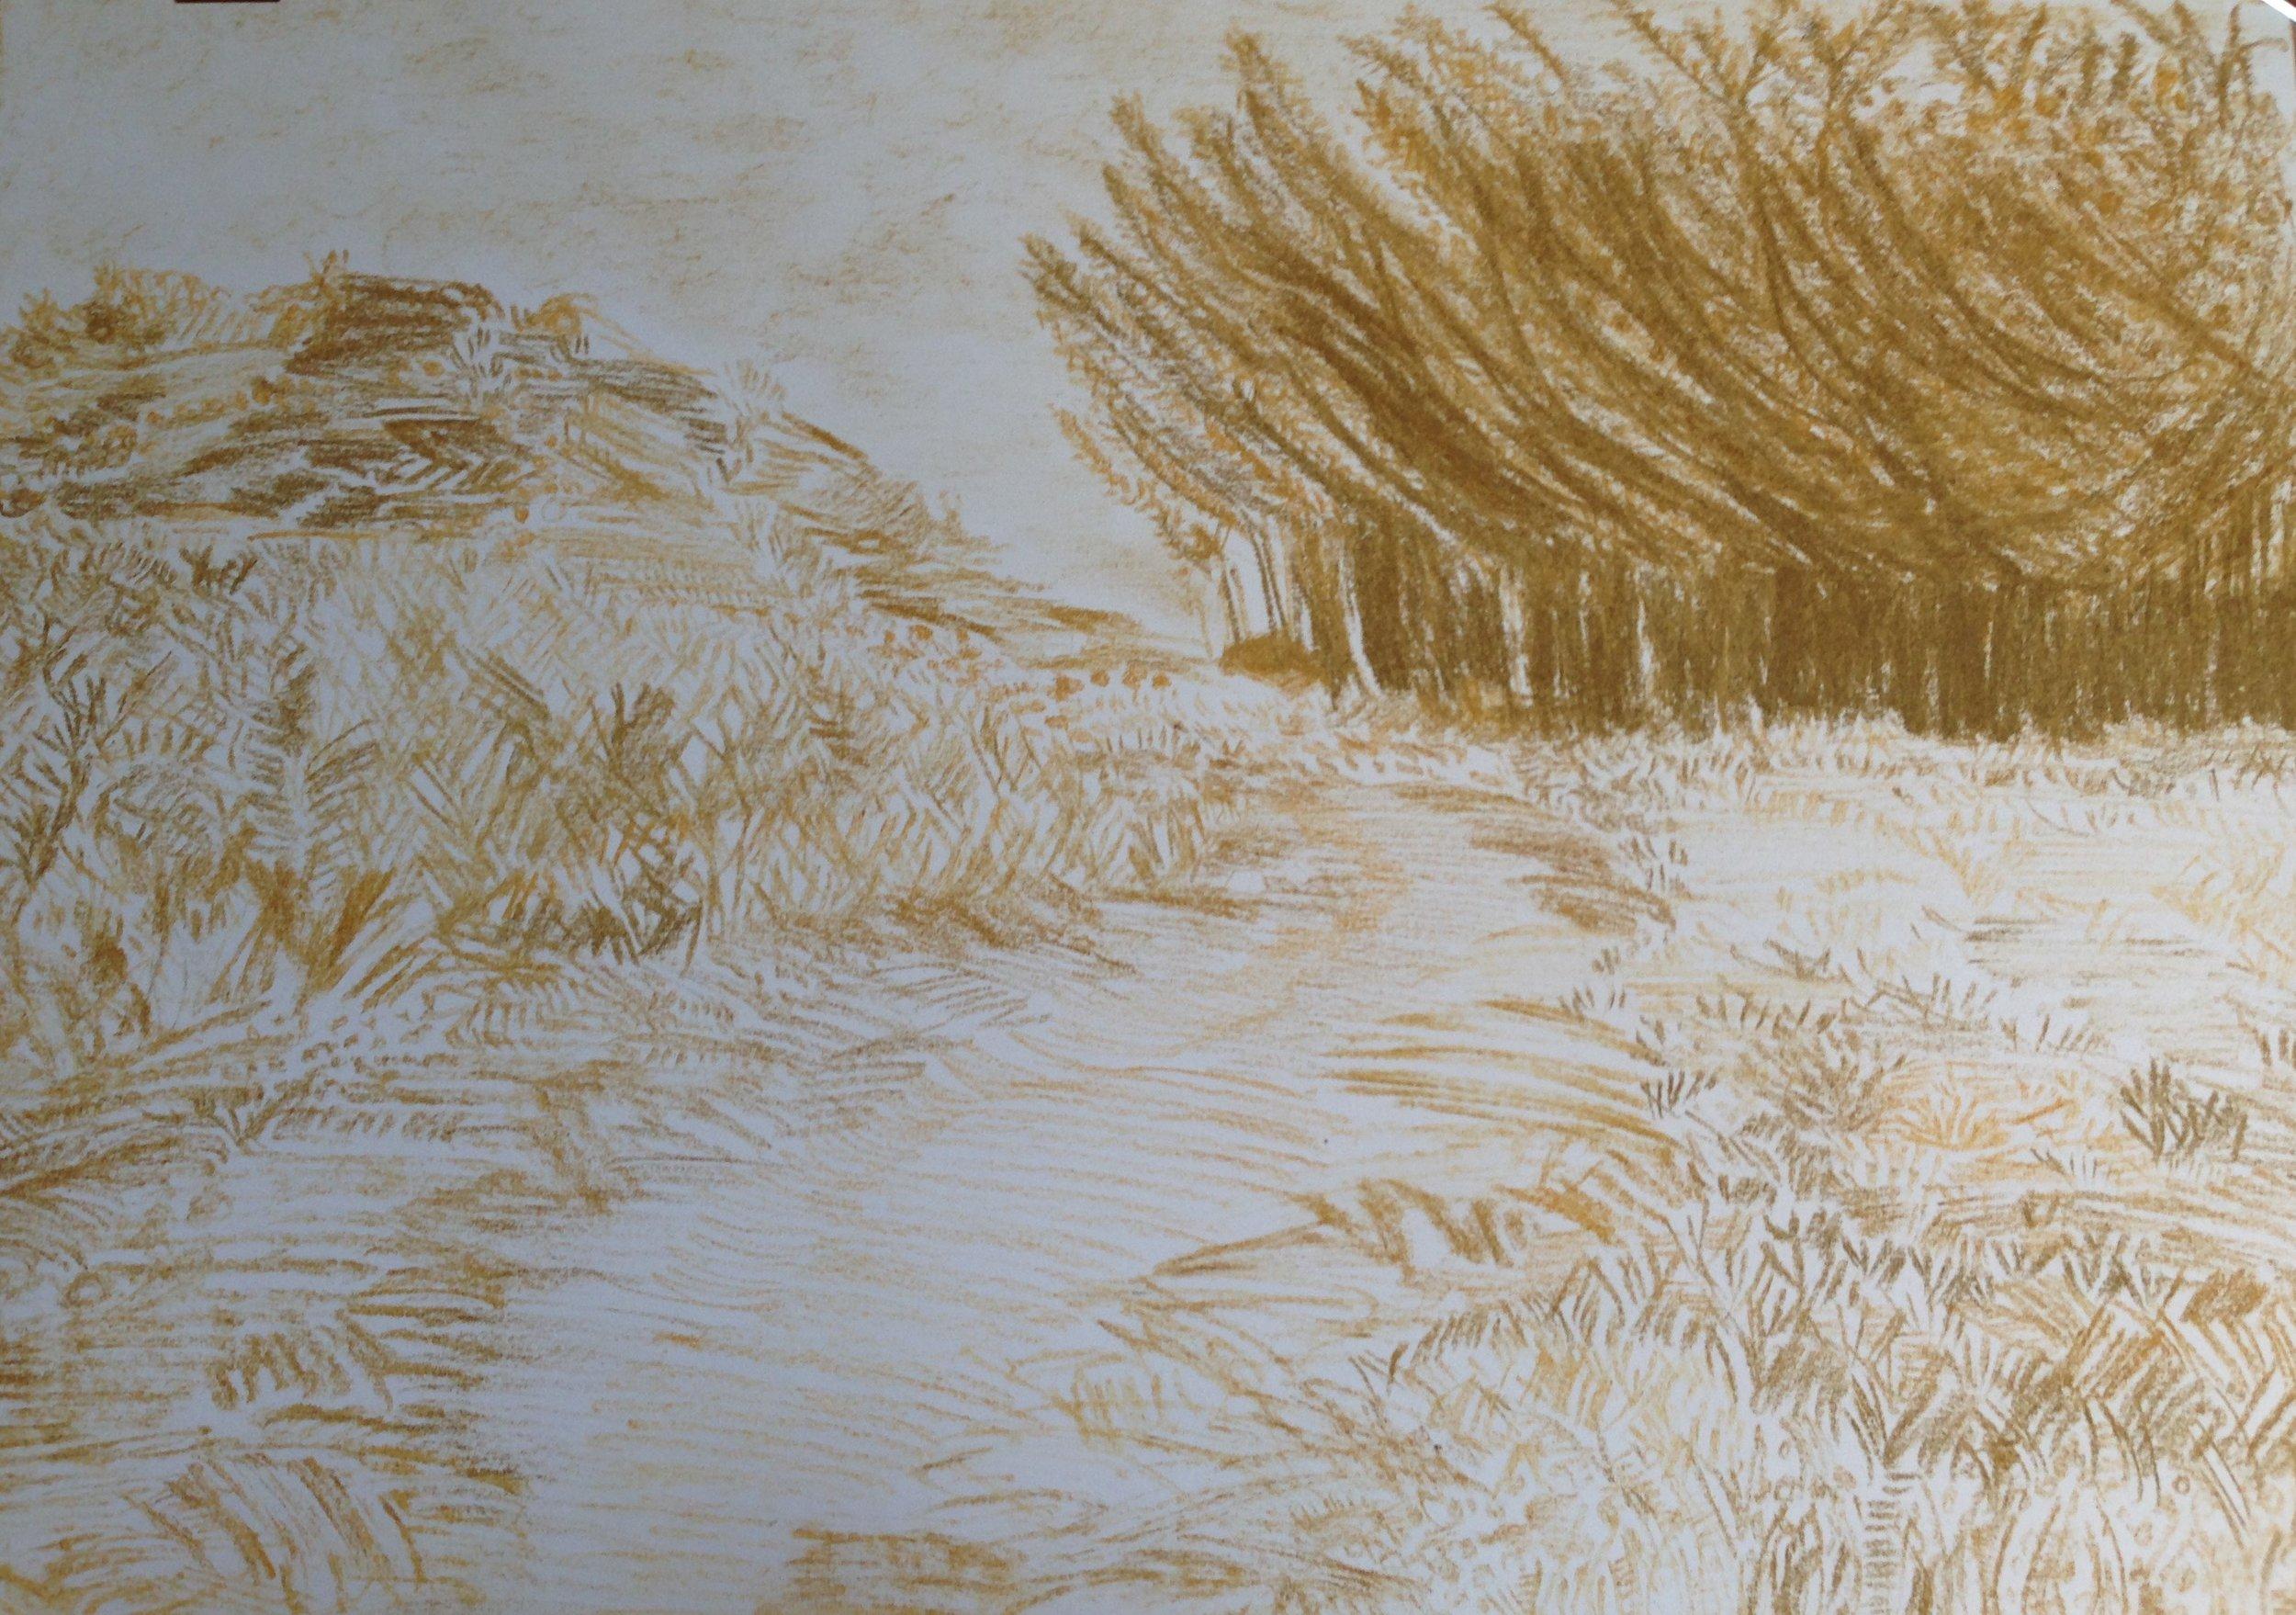 Melville Koppies I (2014). Sandstone on paper. A4